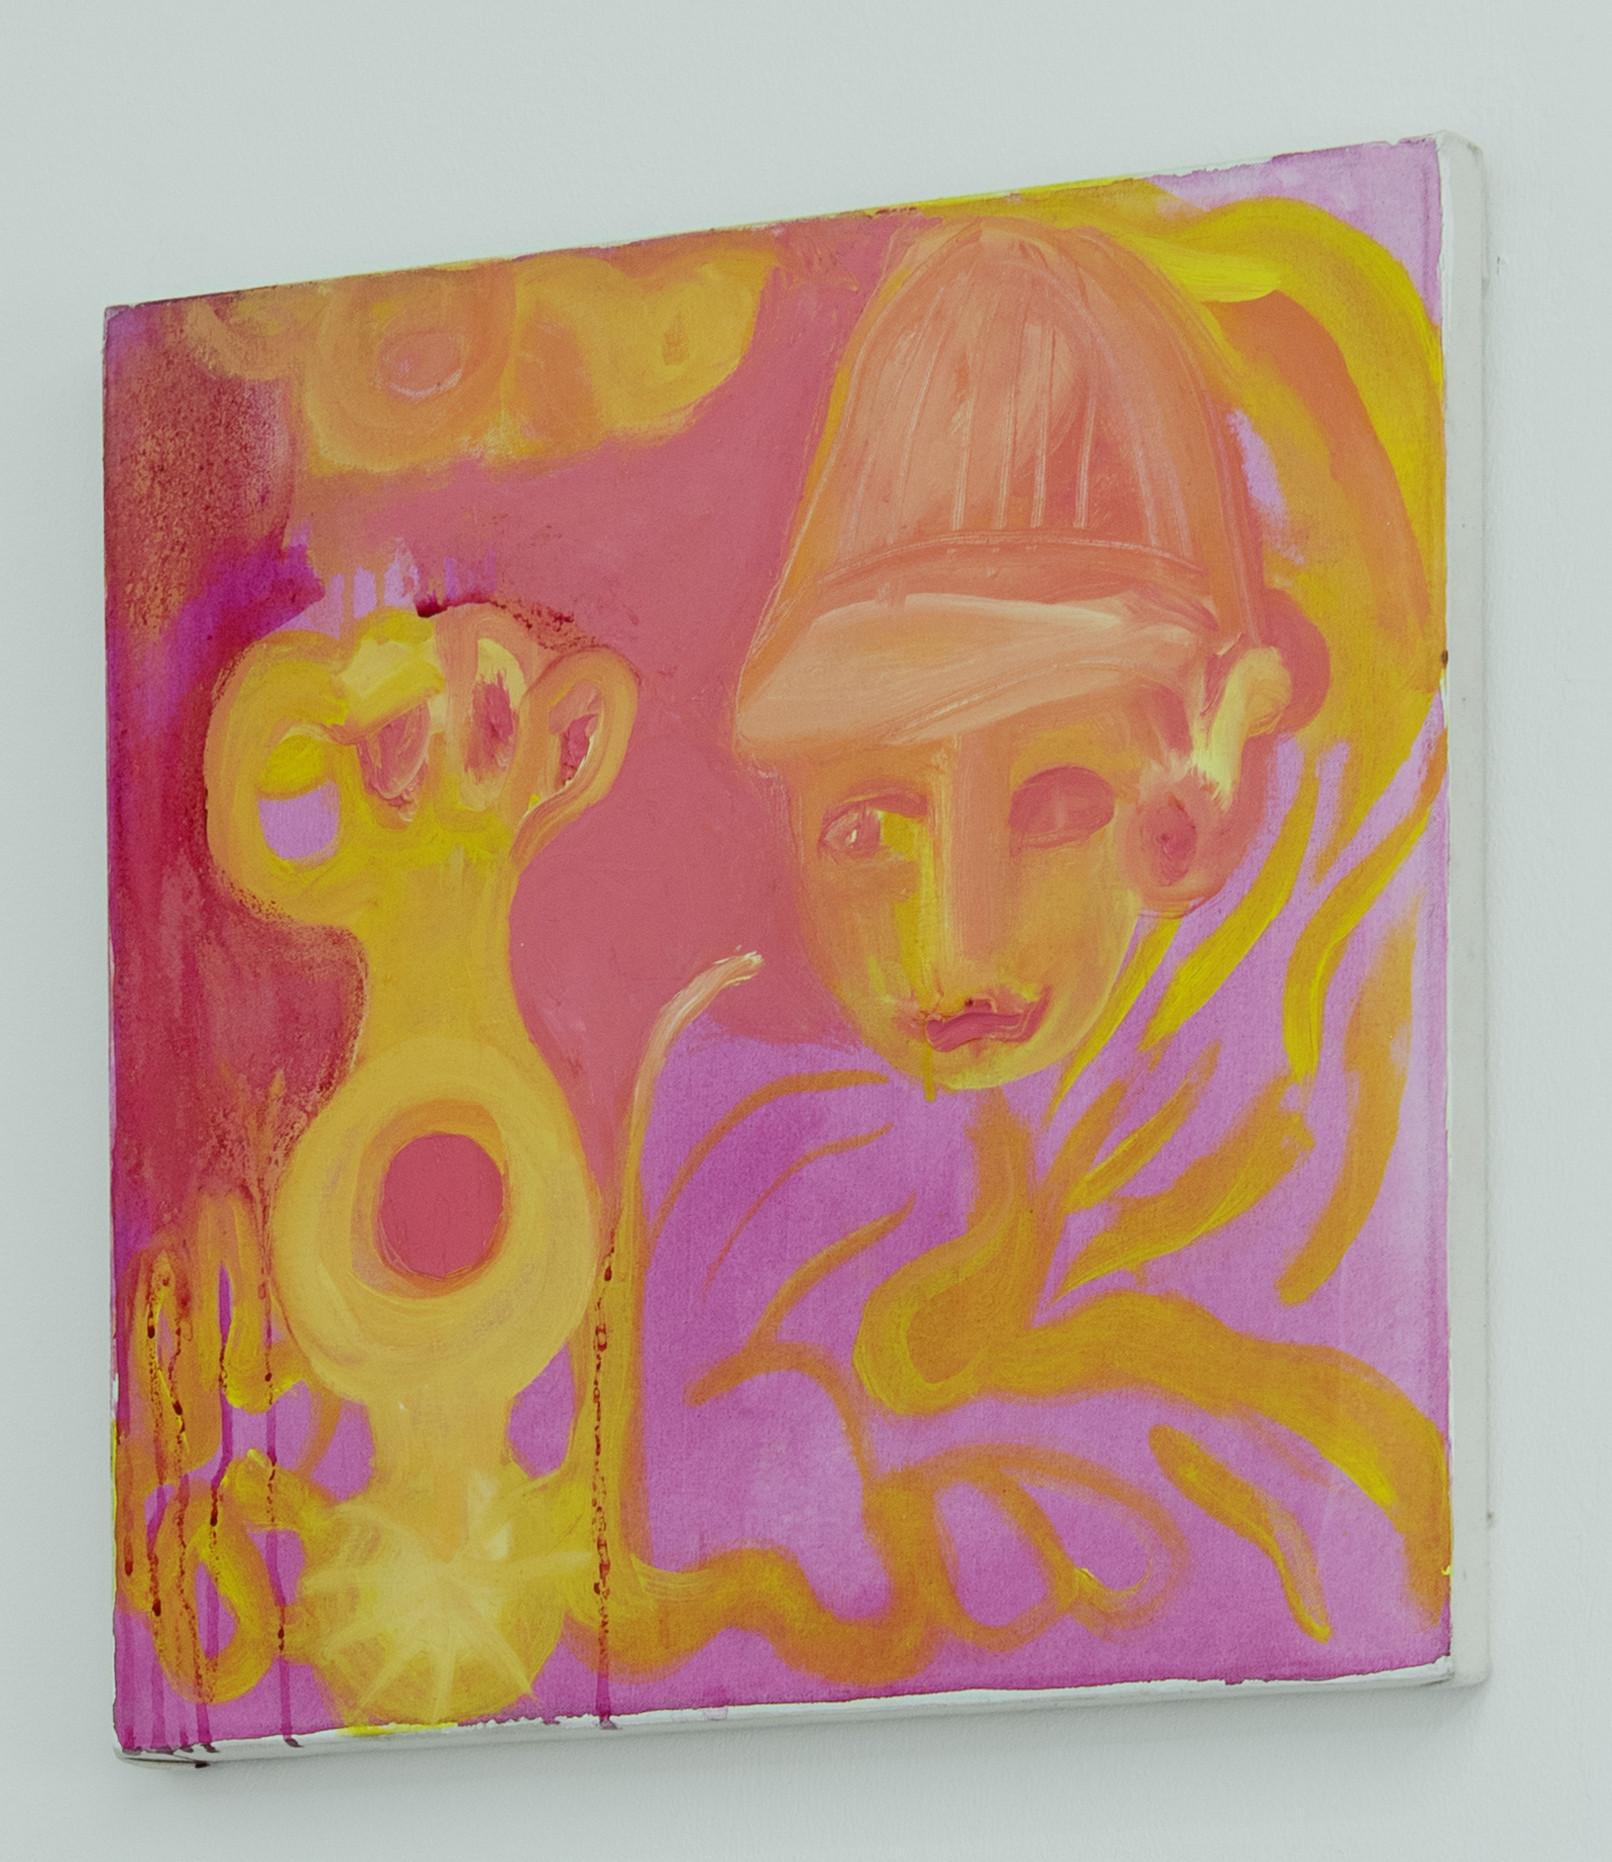 Oil on Canvas, 50*50 cm